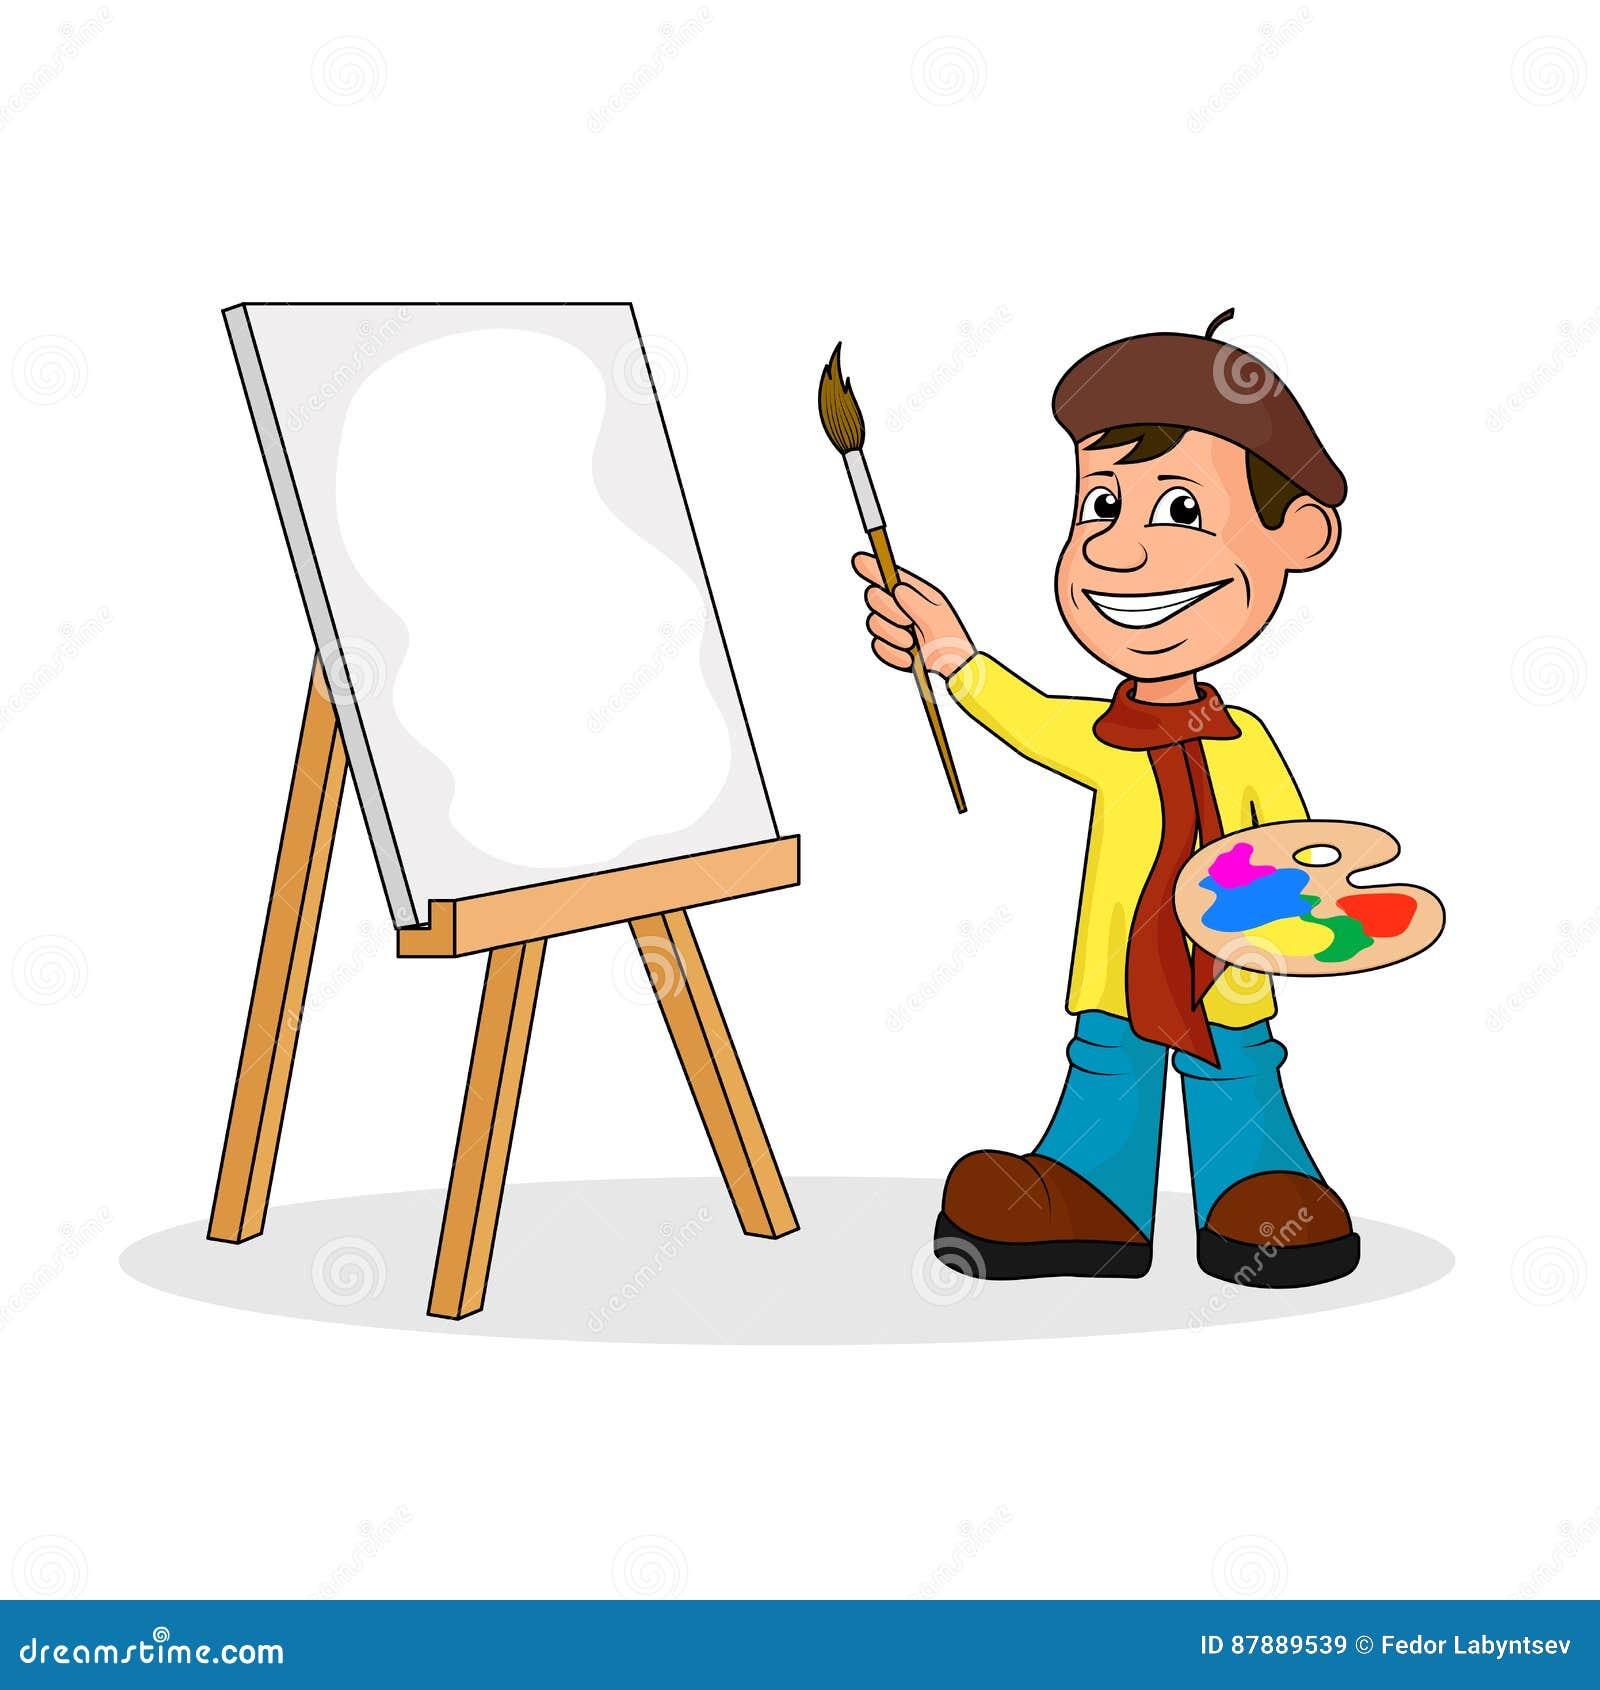 Ð ¡ heerful artysta z muśnięciem i farbami